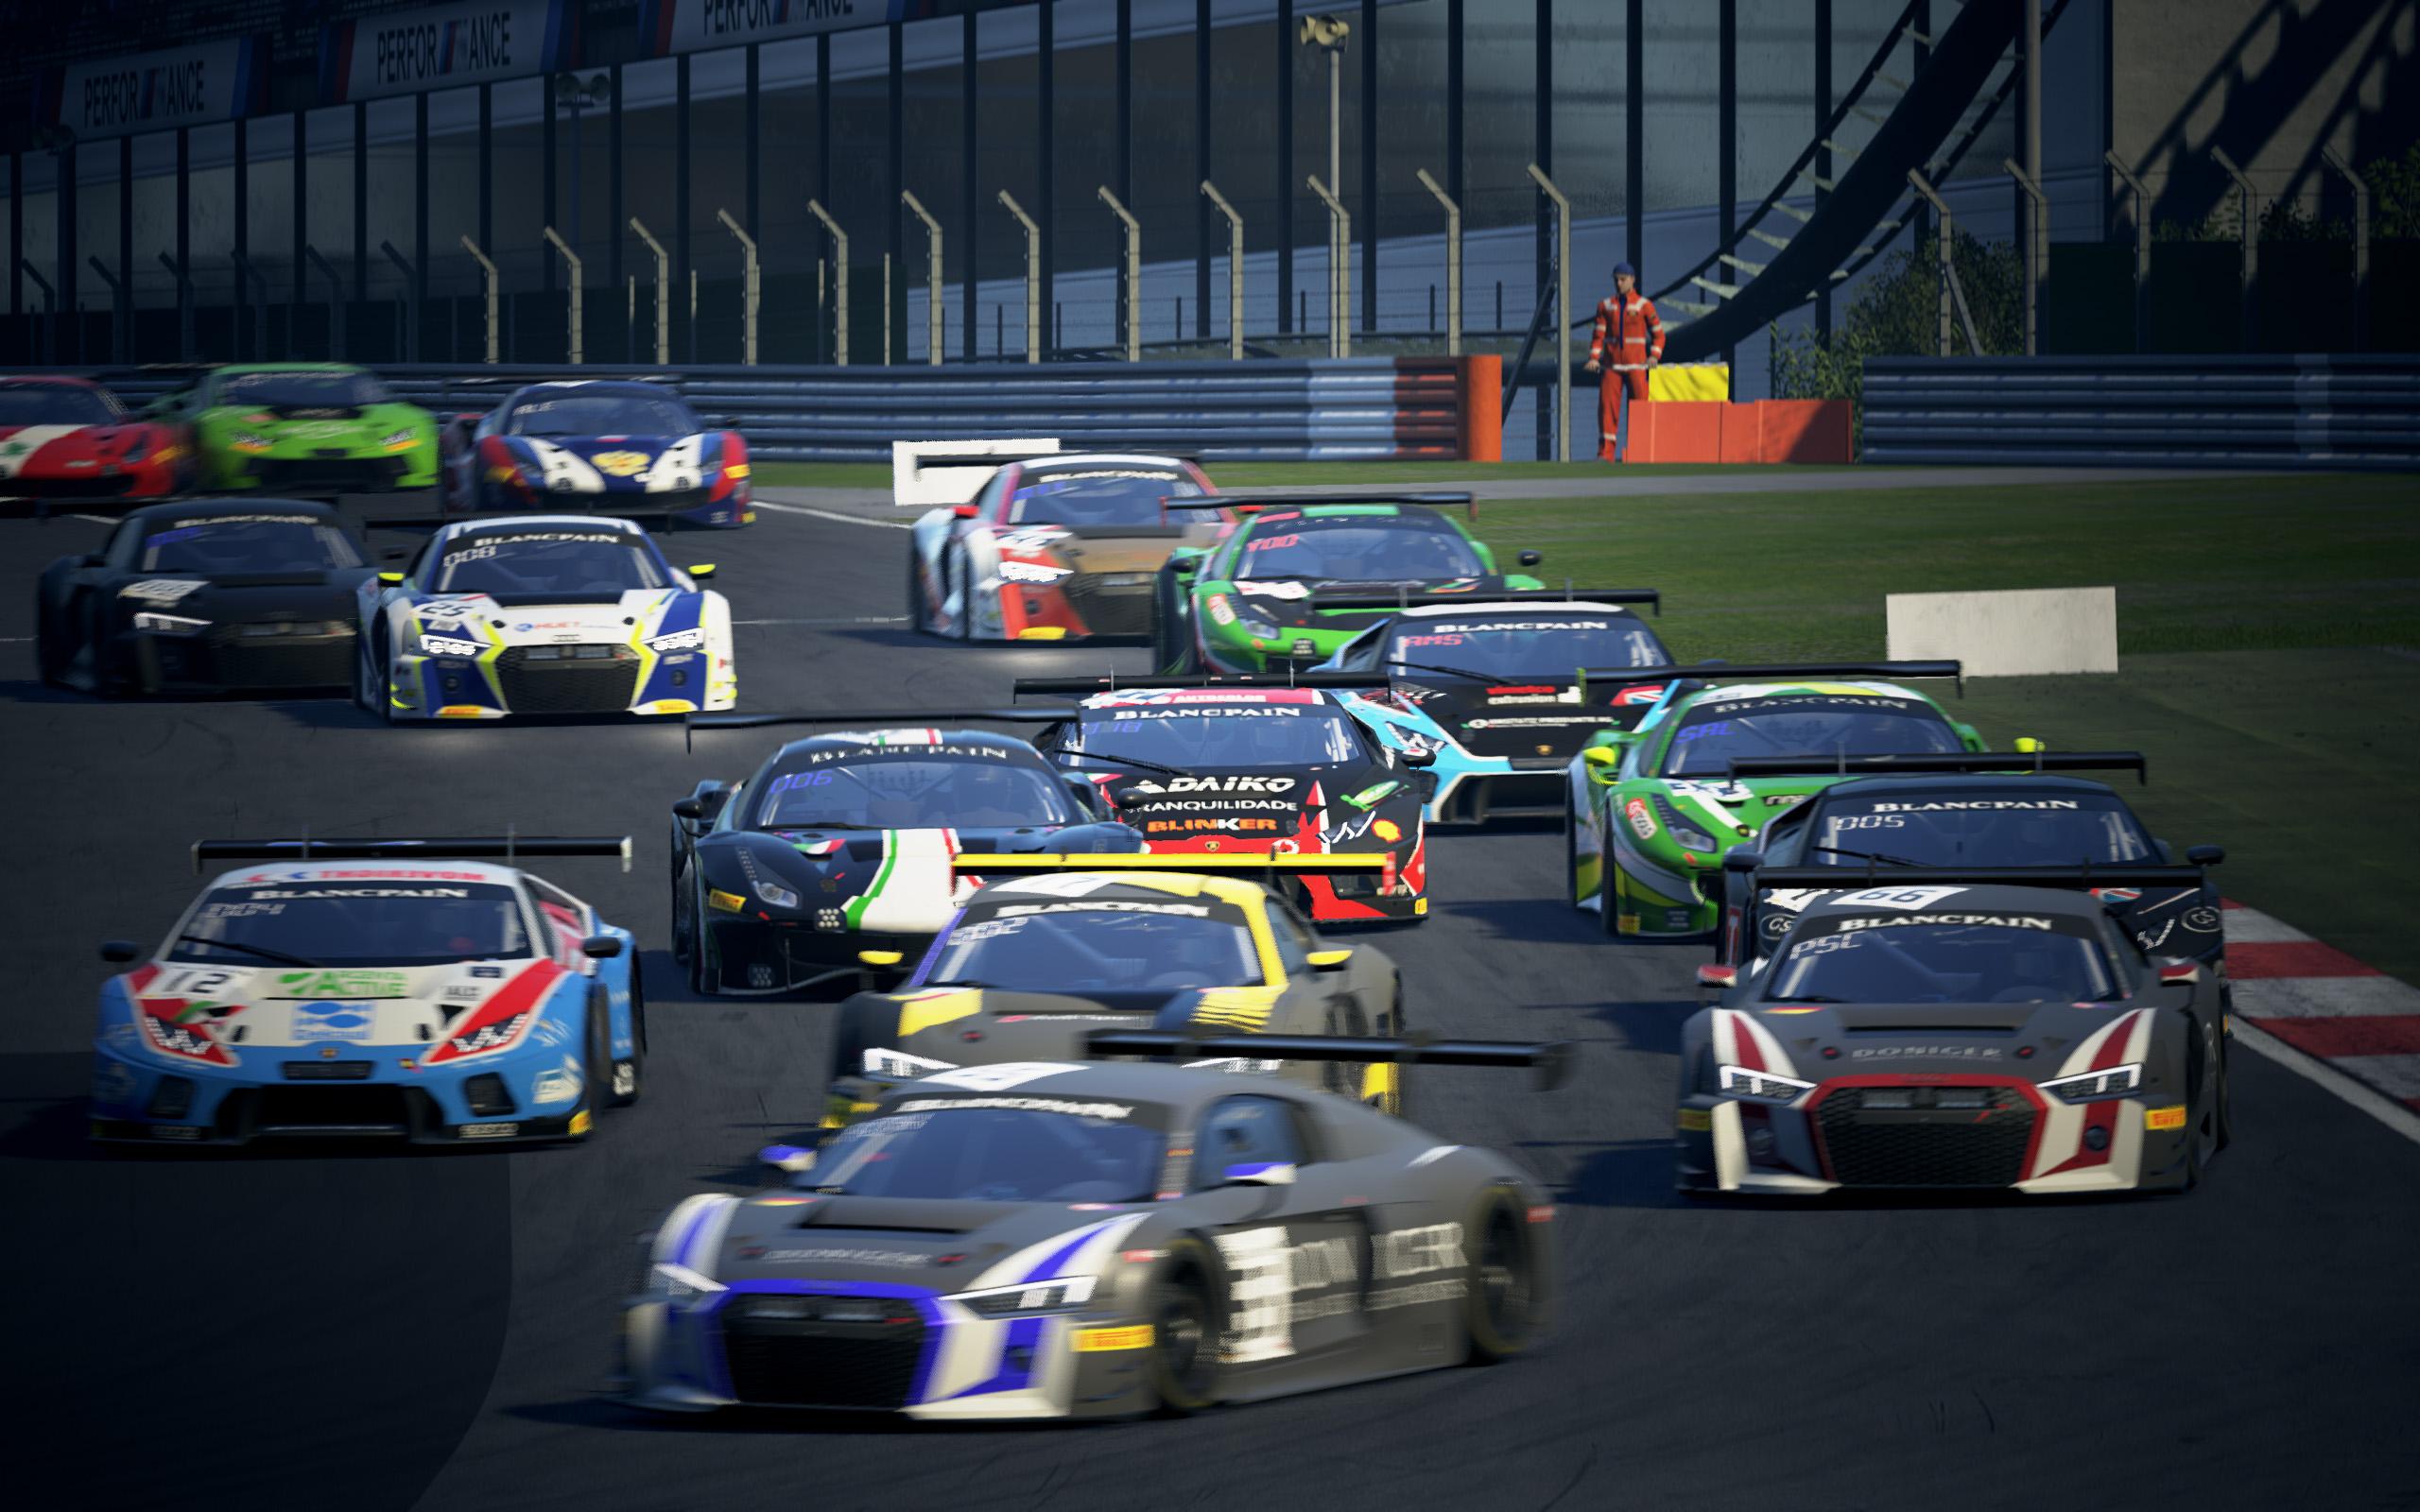 Assetto Corsa Competizione is a rigorous, authentic racing